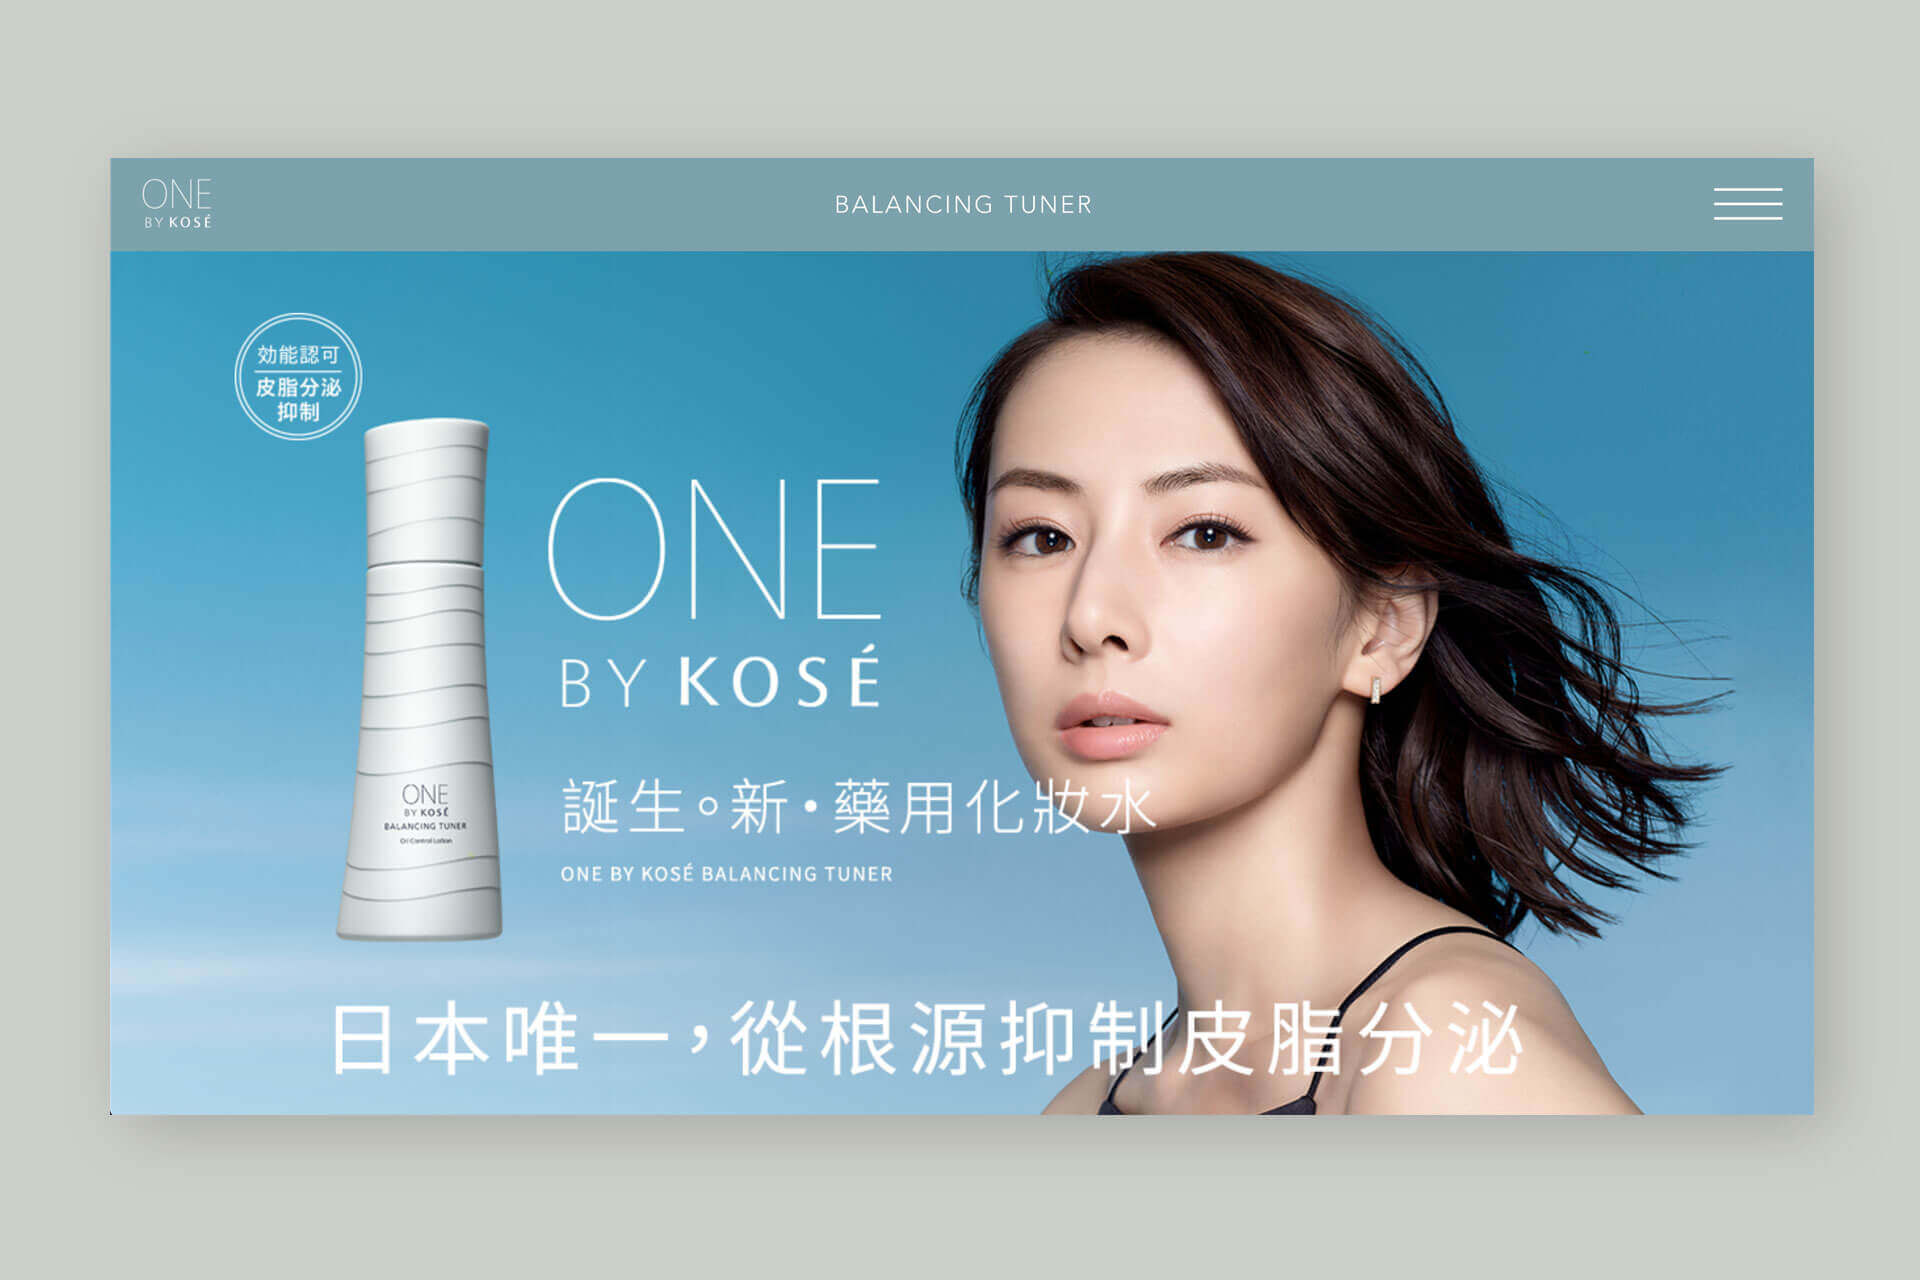 Kose - One by Kose